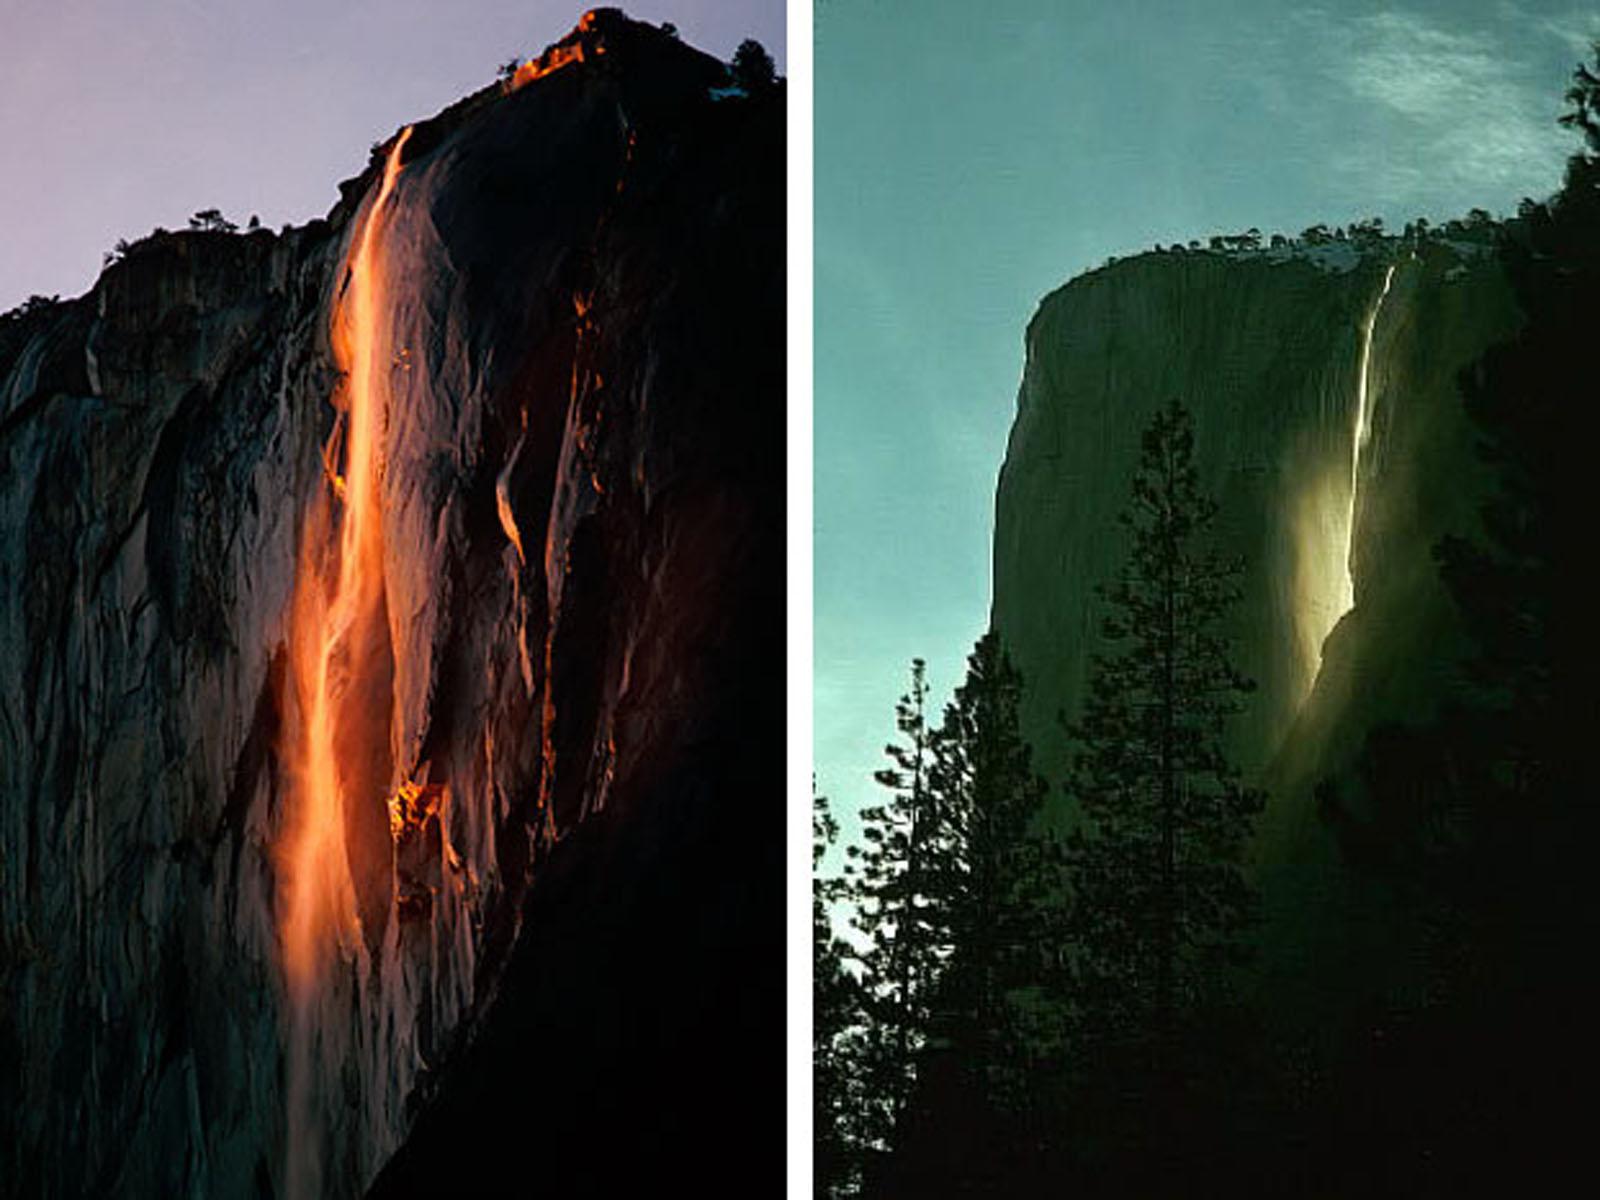 Fall Colors Wallpaper 1920x1080 Horsetail Falls Yosemite National Park California 2013